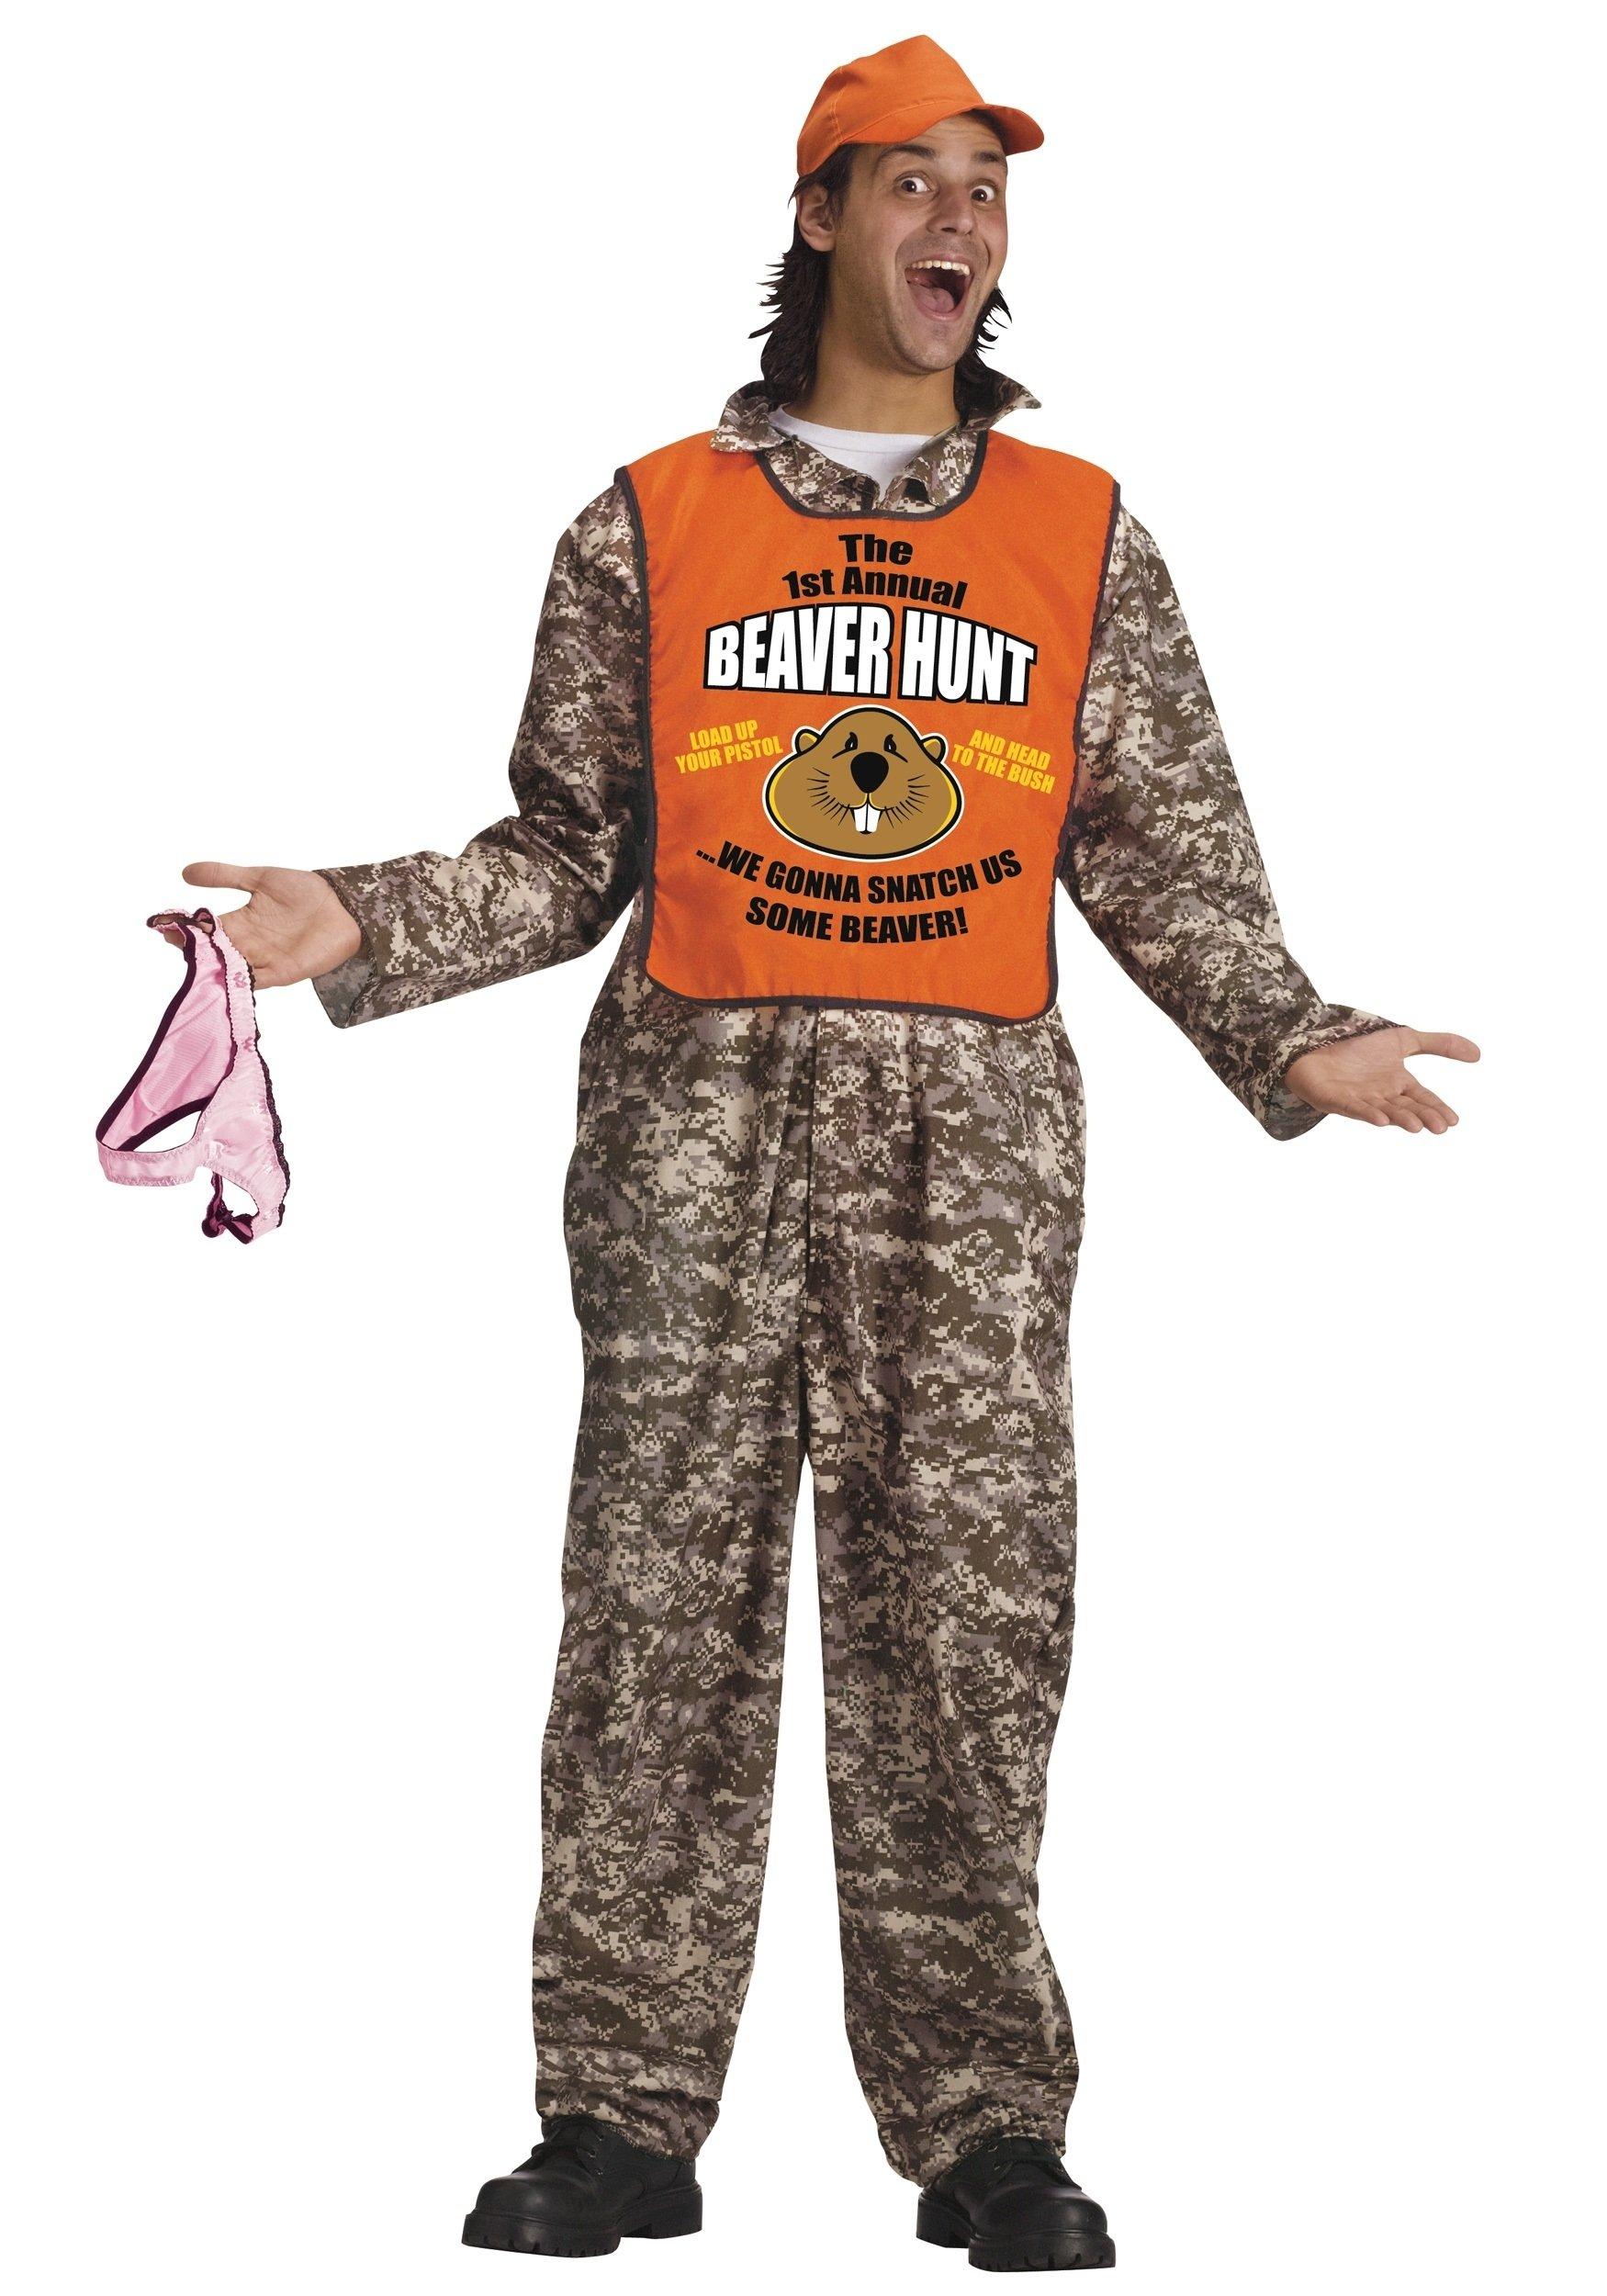 10 Elegant Funny Male Halloween Costume Ideas adult beaver hunter costume halloween costumes 8  sc 1 st  Unique Ideas 2018 & 10 Elegant Funny Male Halloween Costume Ideas